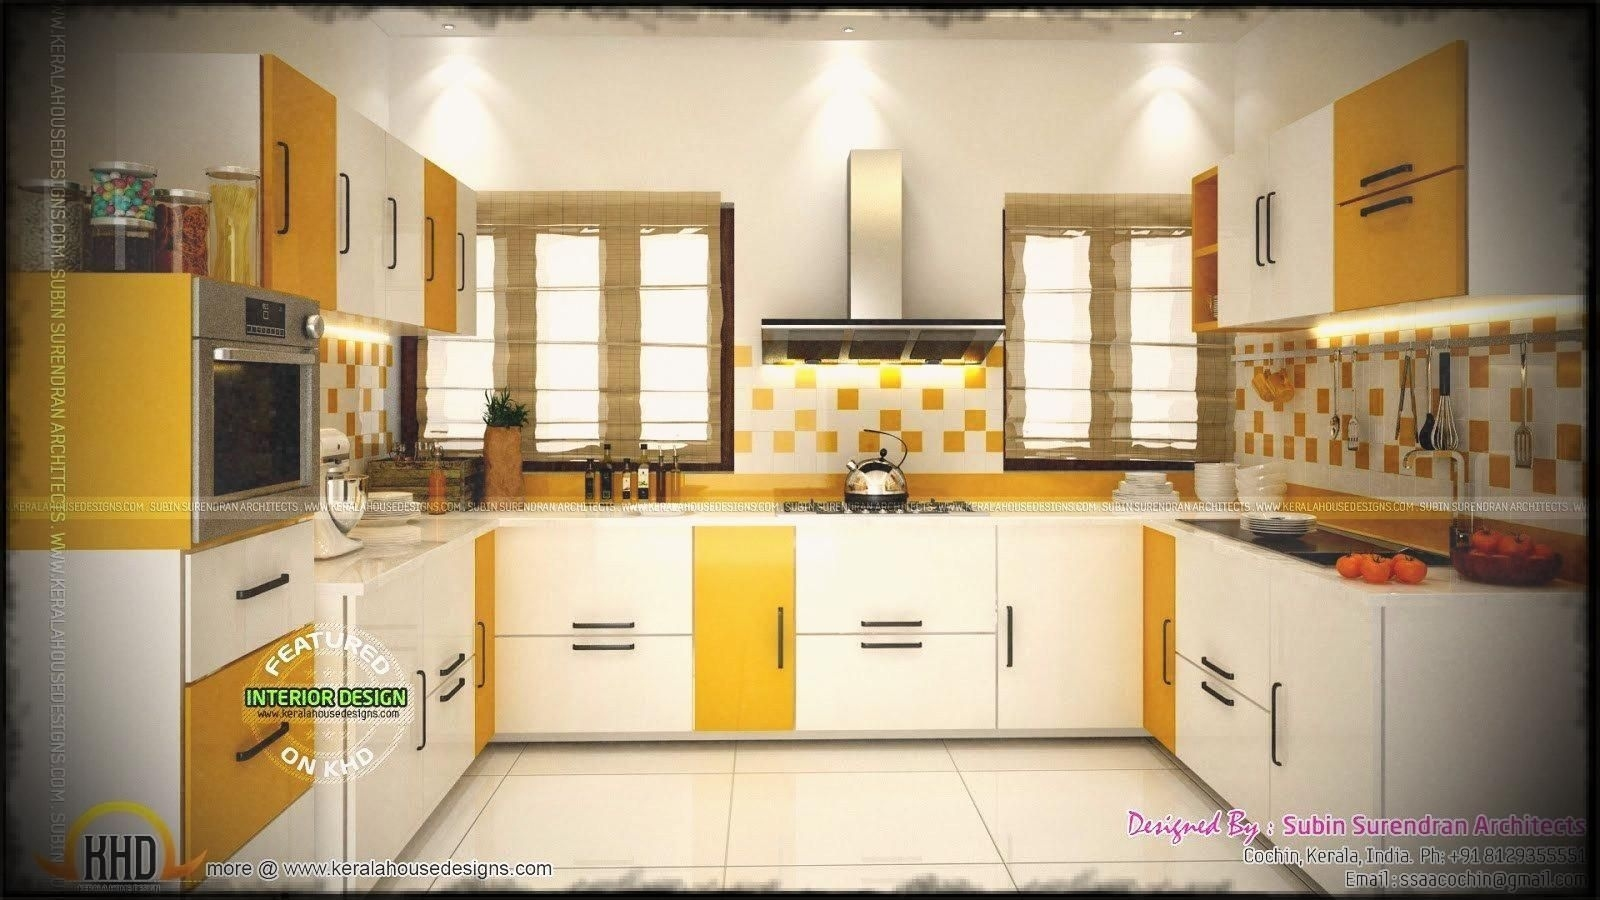 Kitchen Cabinet Design Catalogue Pdf - Kitchen and Bath